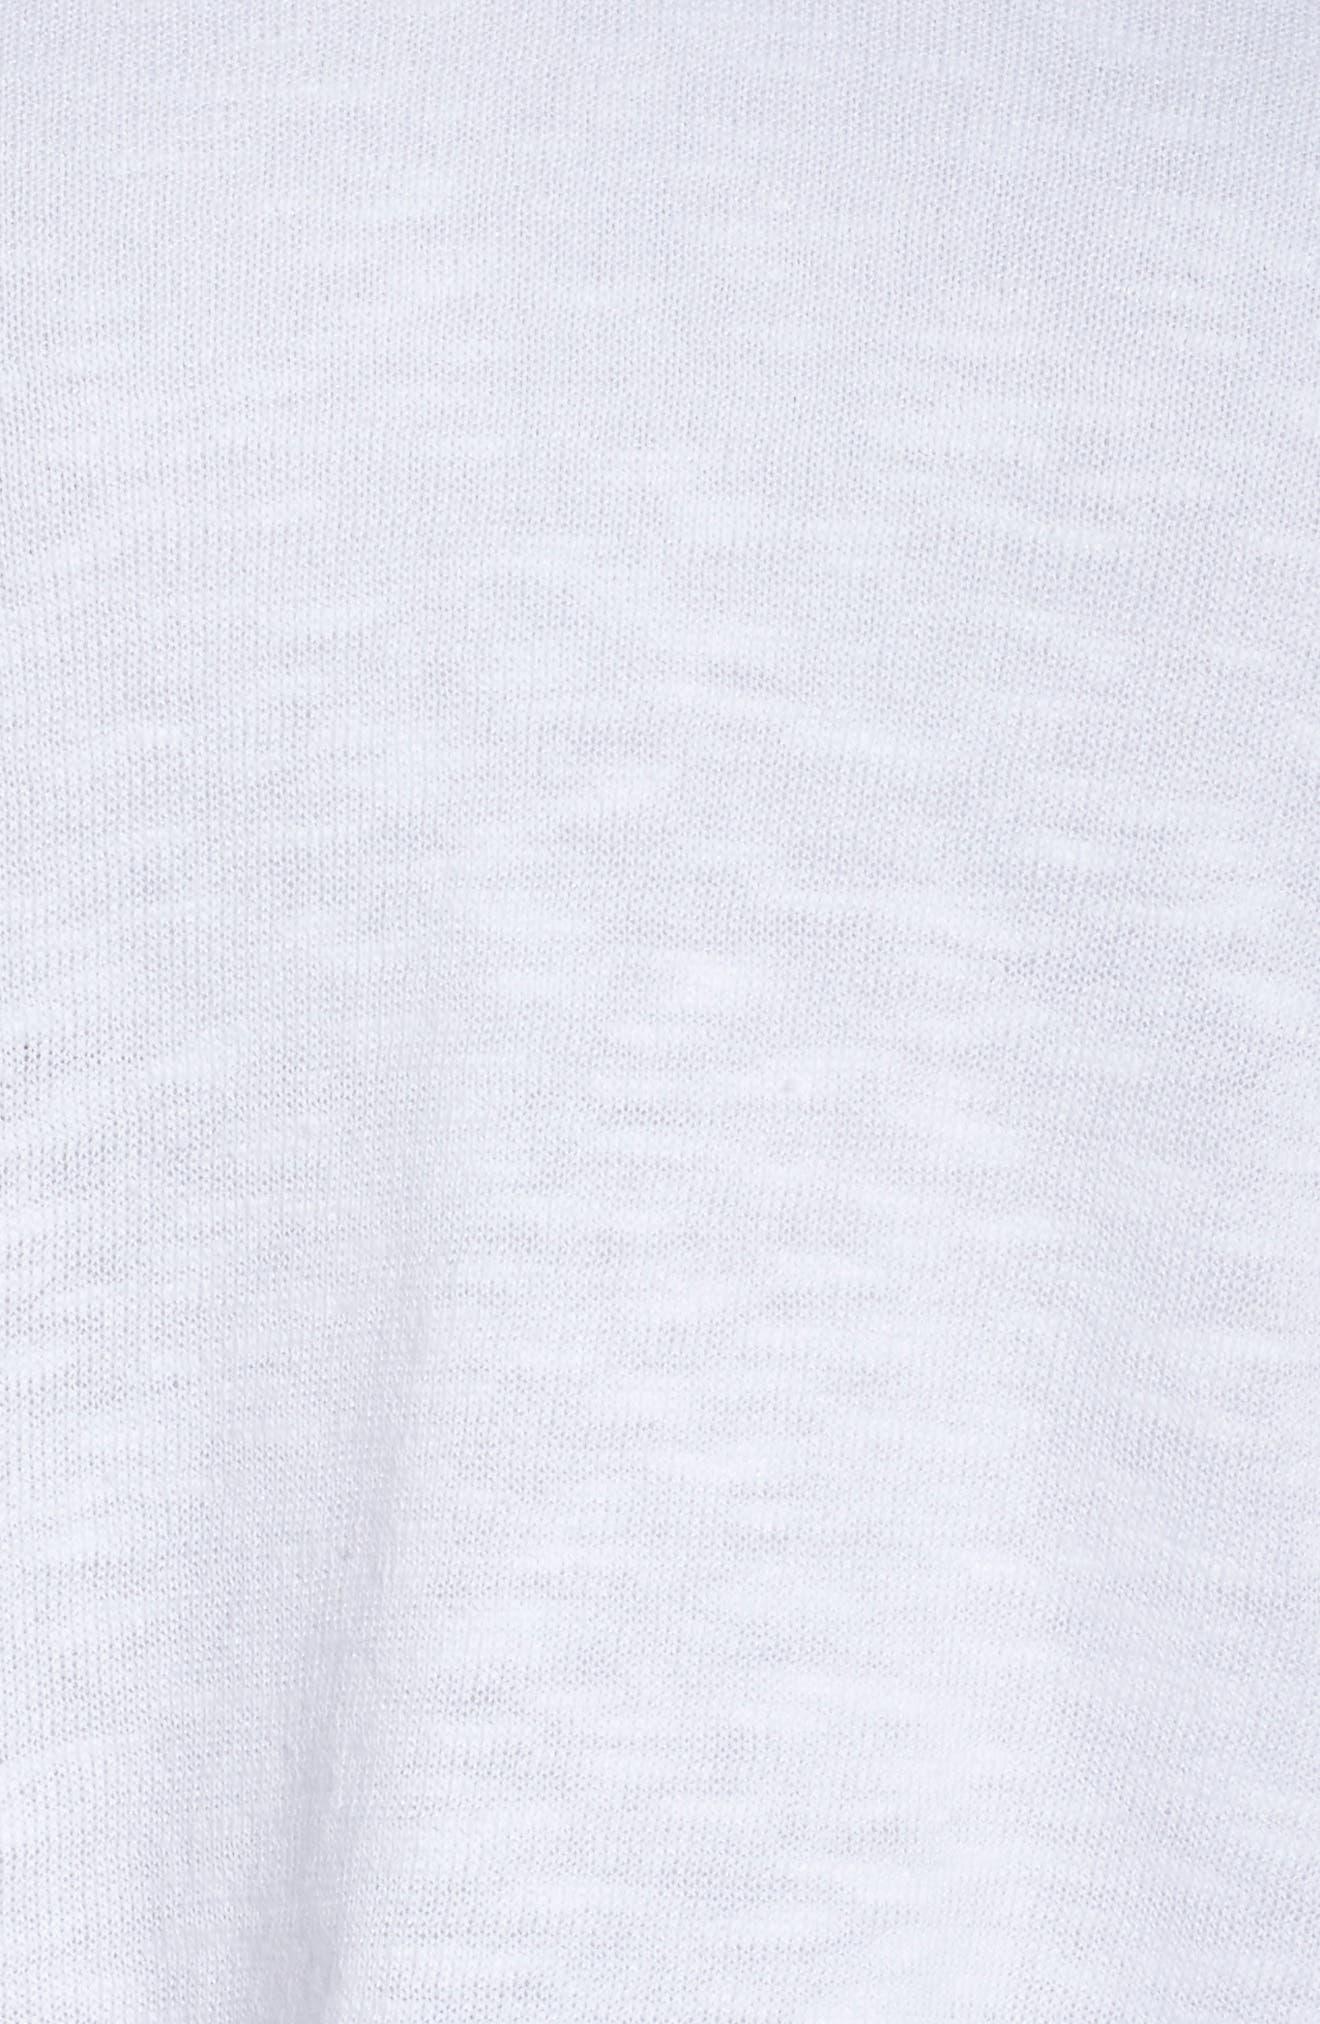 Boxy Organic Linen & Cotton Sweater,                             Alternate thumbnail 6, color,                             100